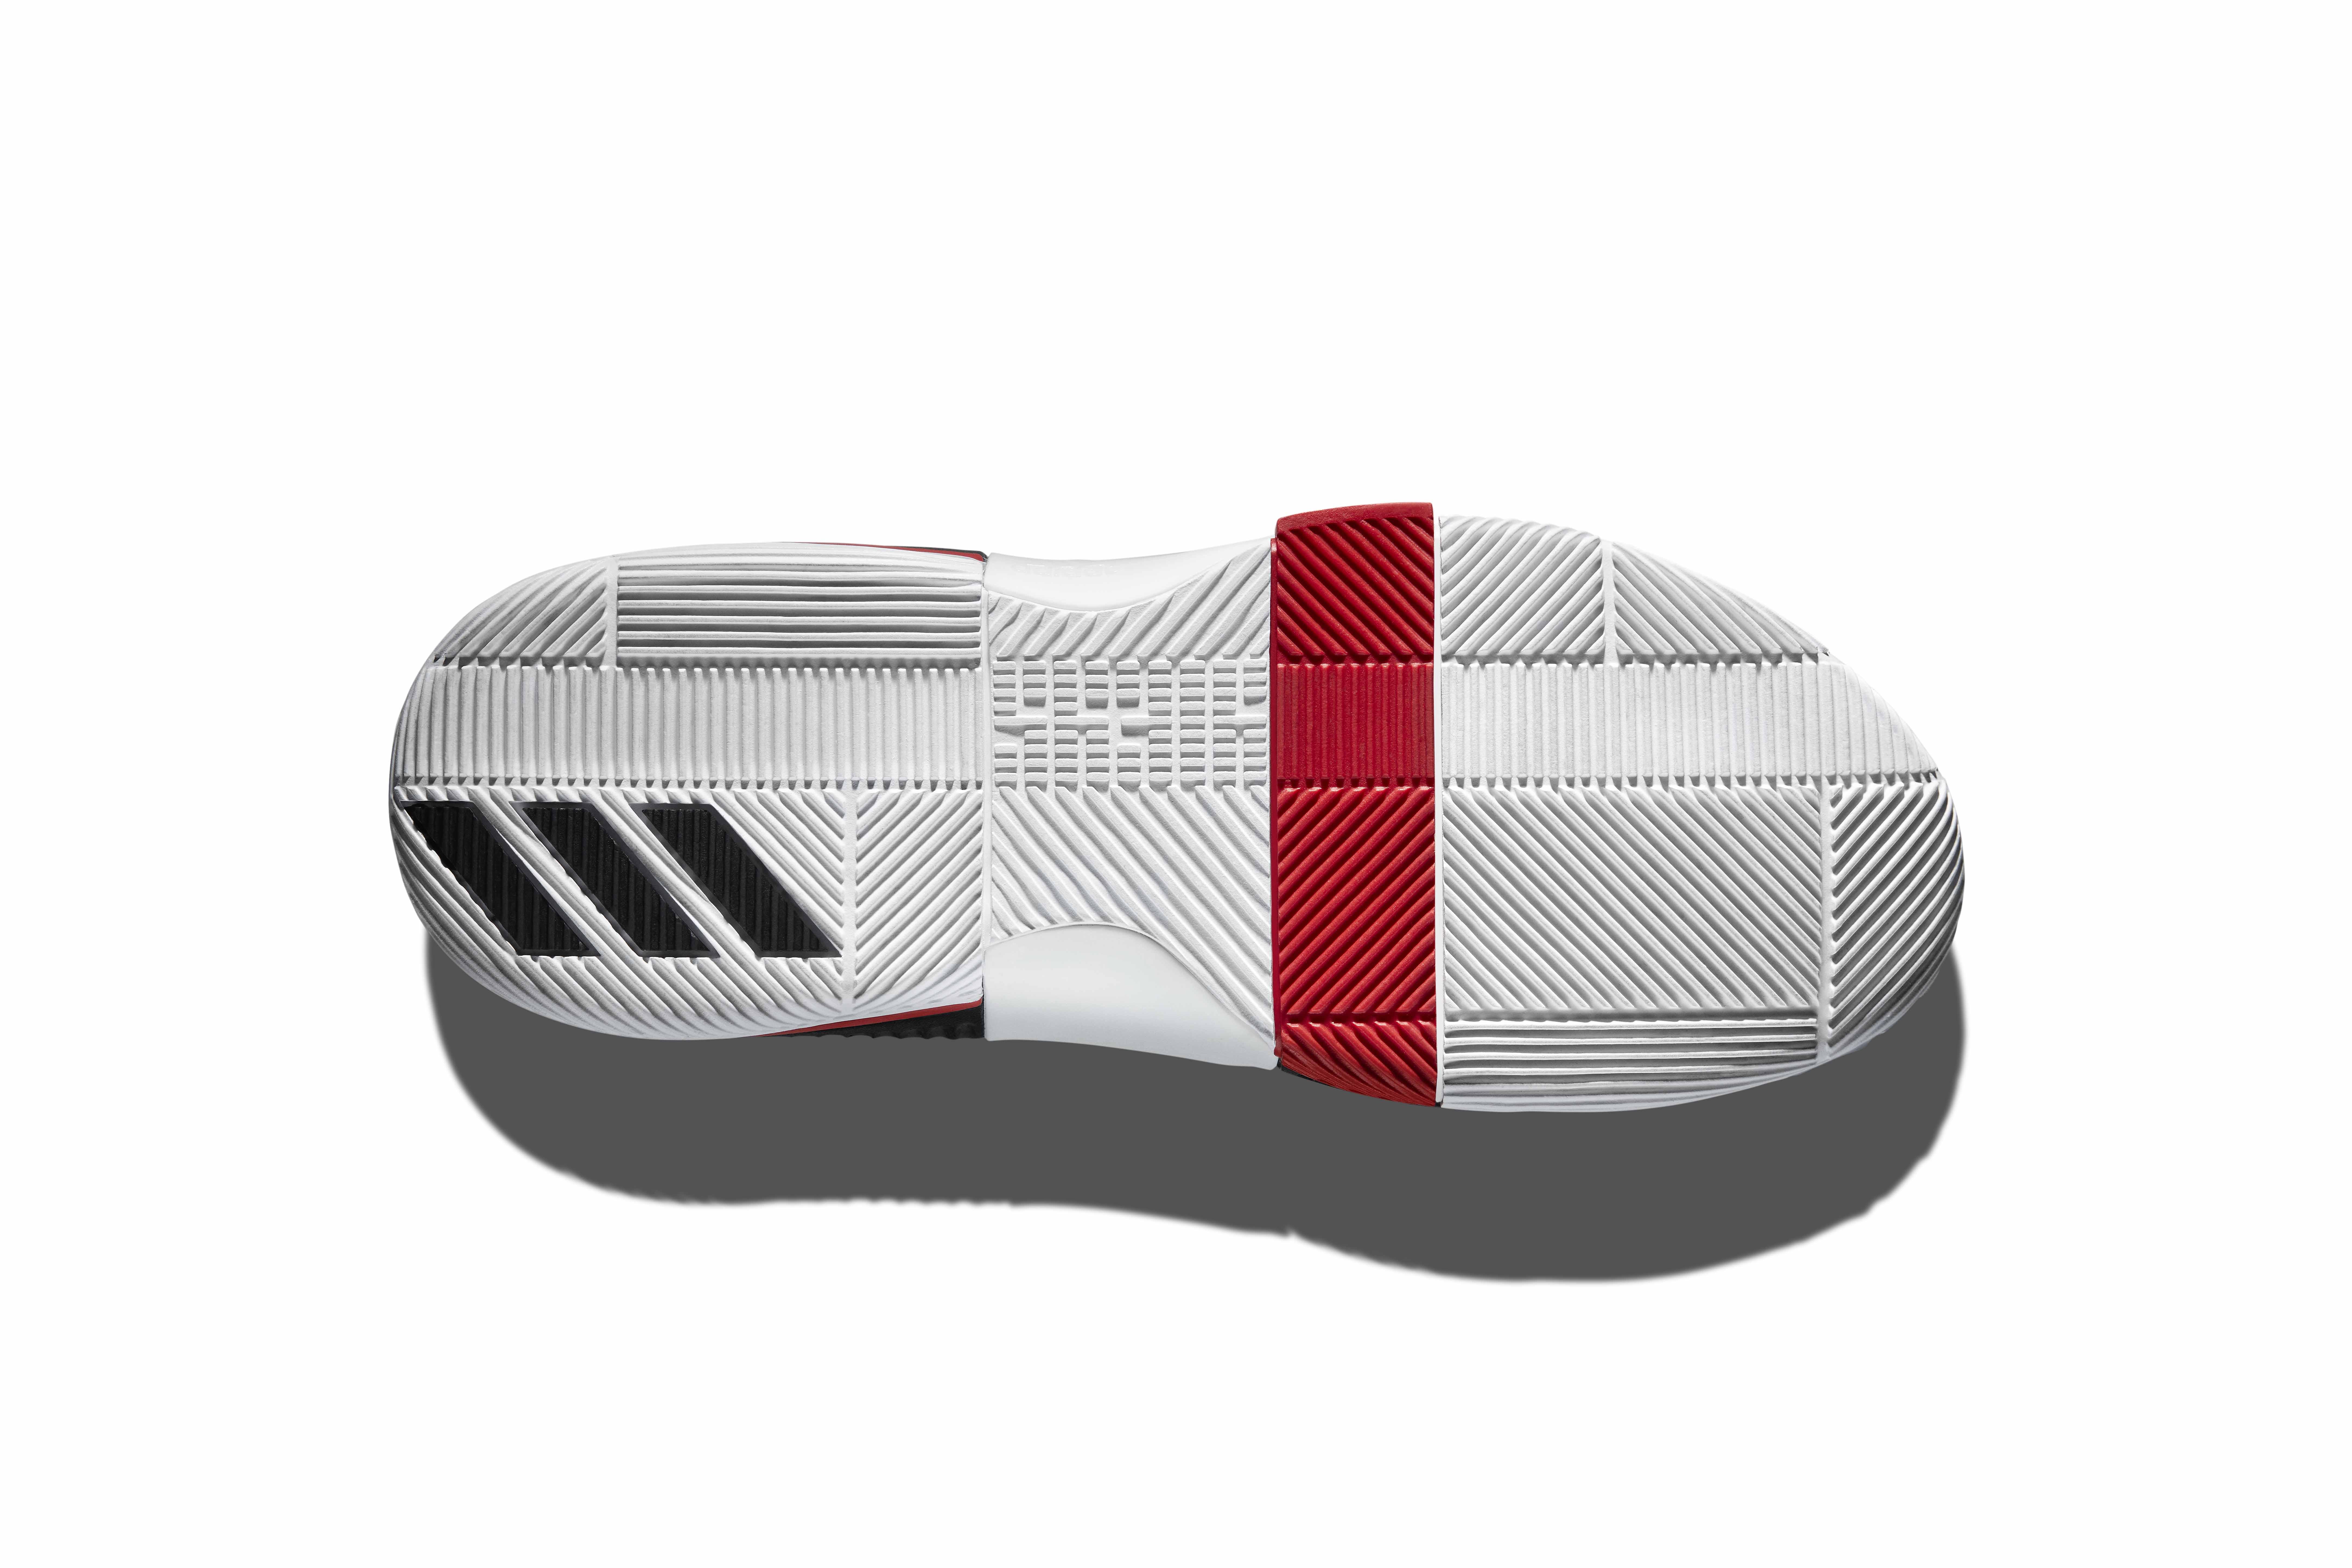 Adidas Dame 3 Outsole